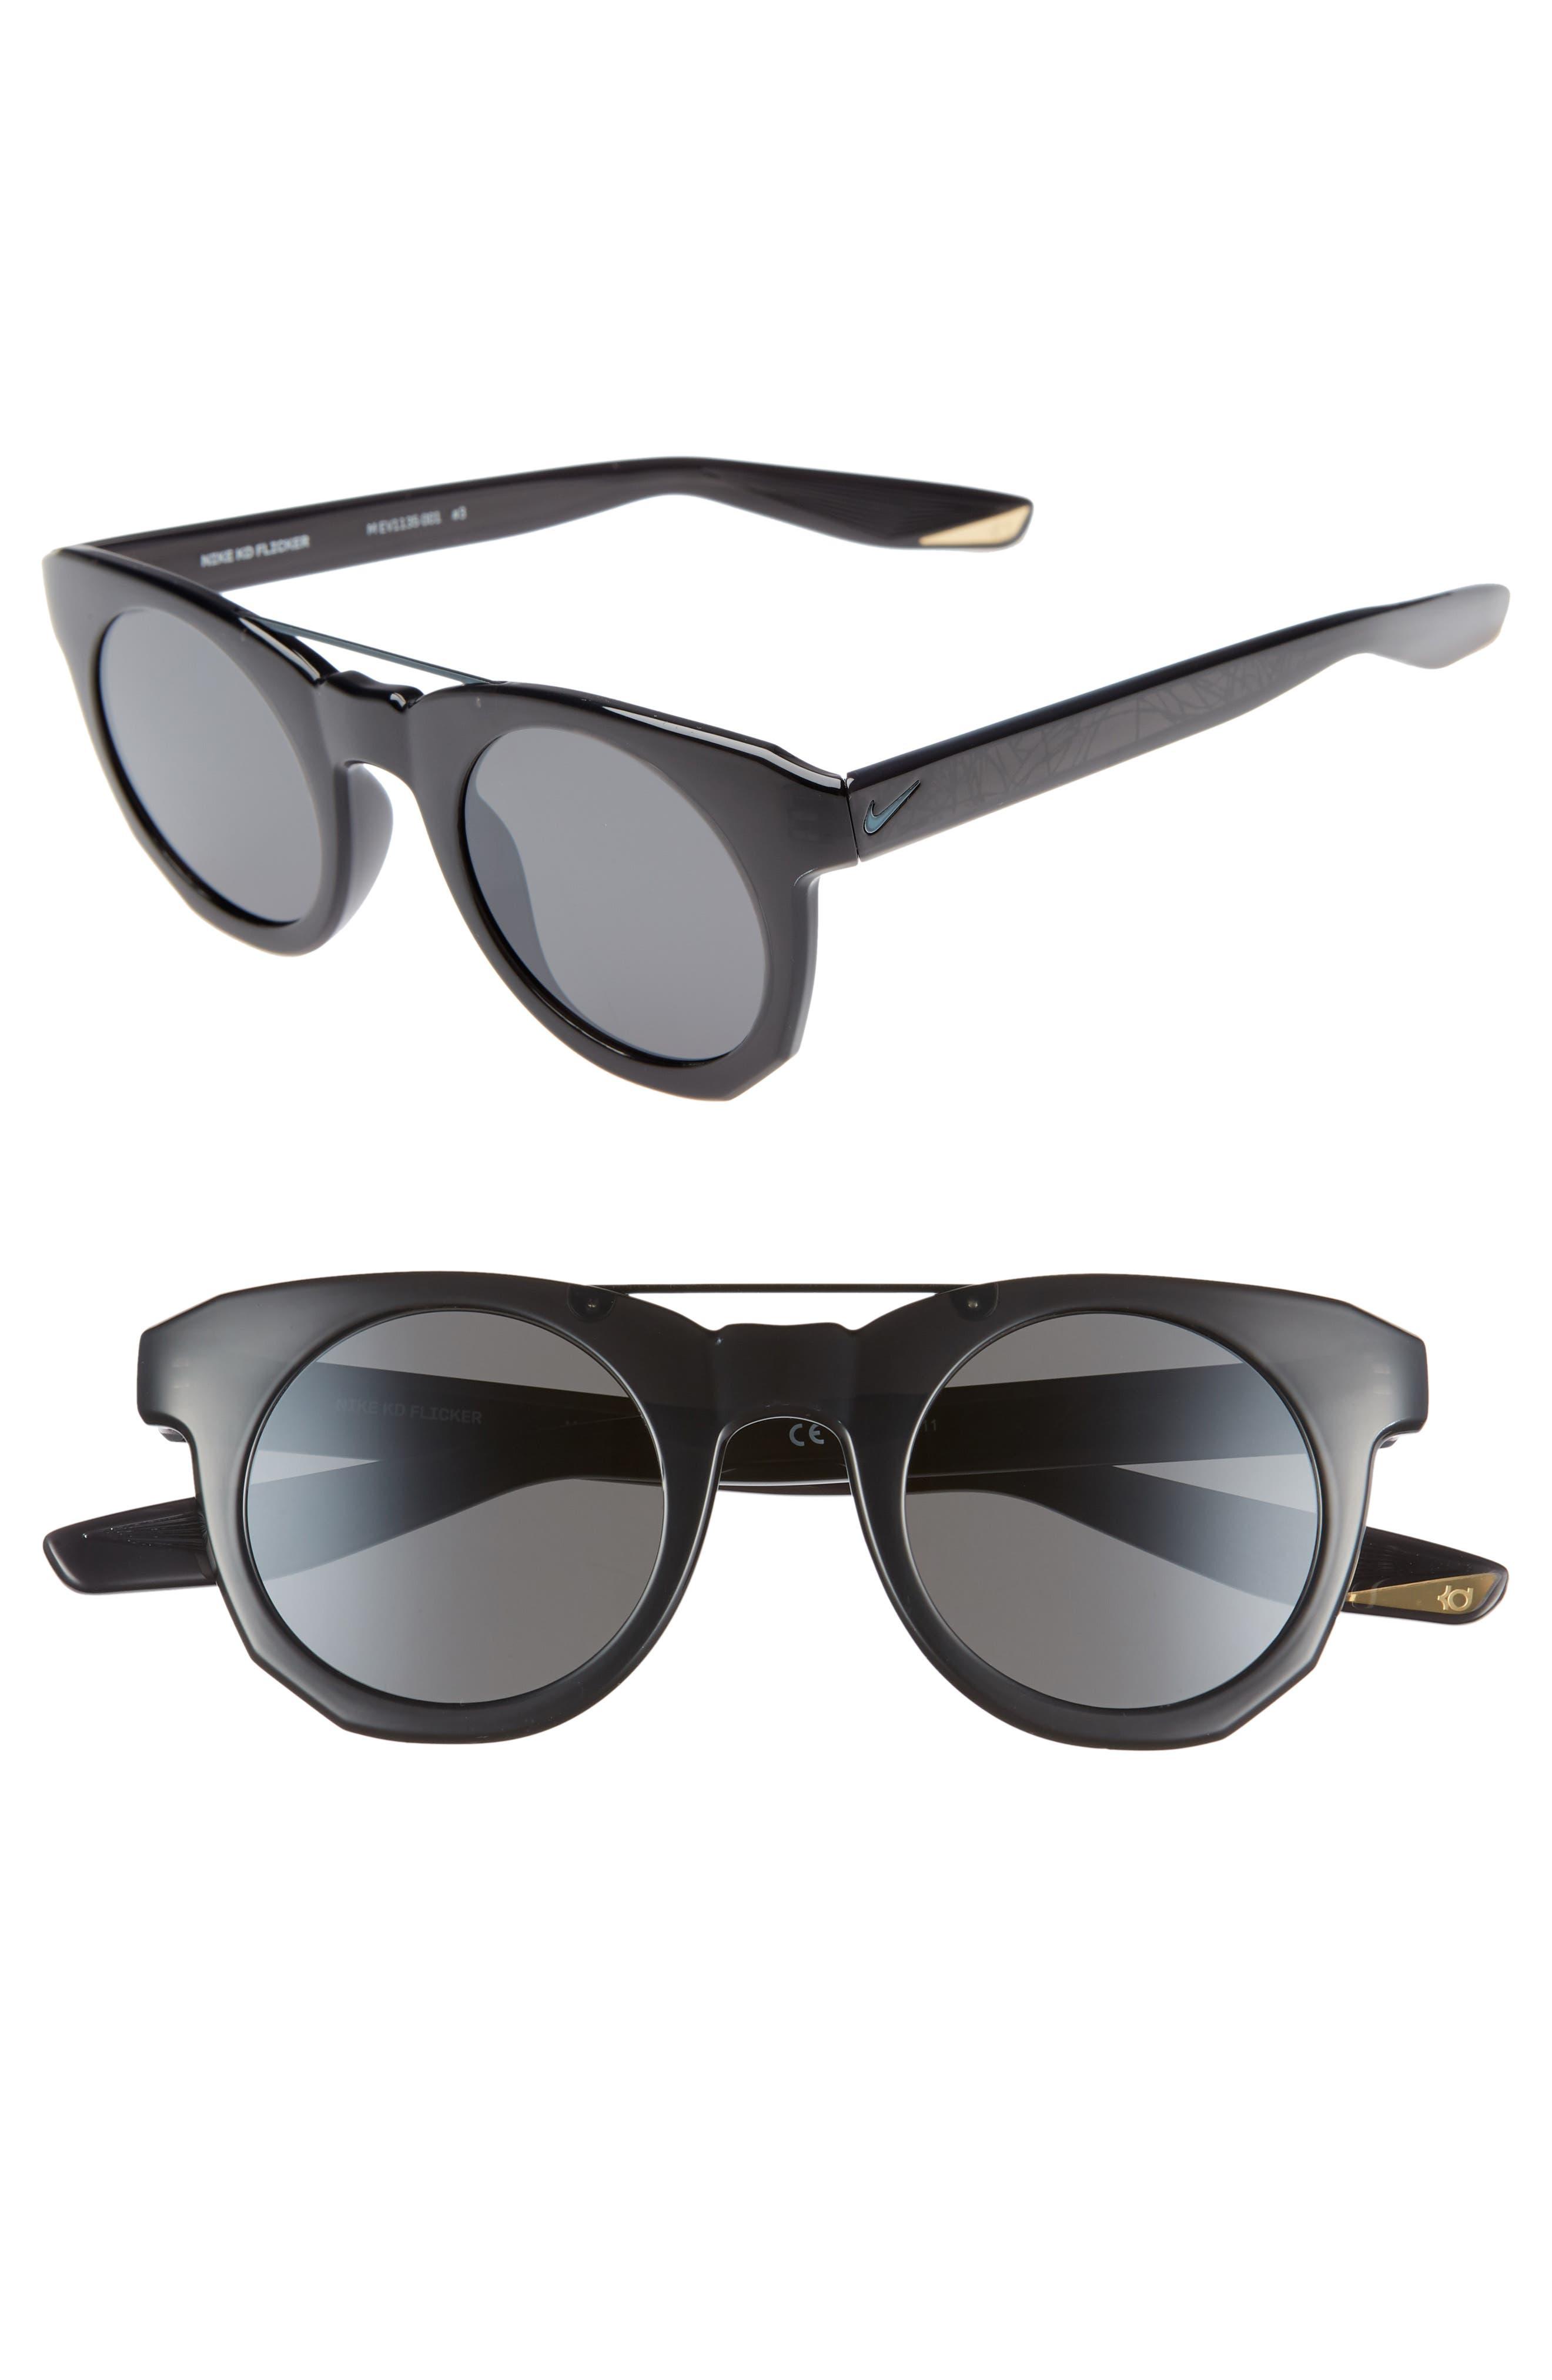 Nike Kd Flicker 4m Round Sunglasses - Oil Grey/ Dark Grey